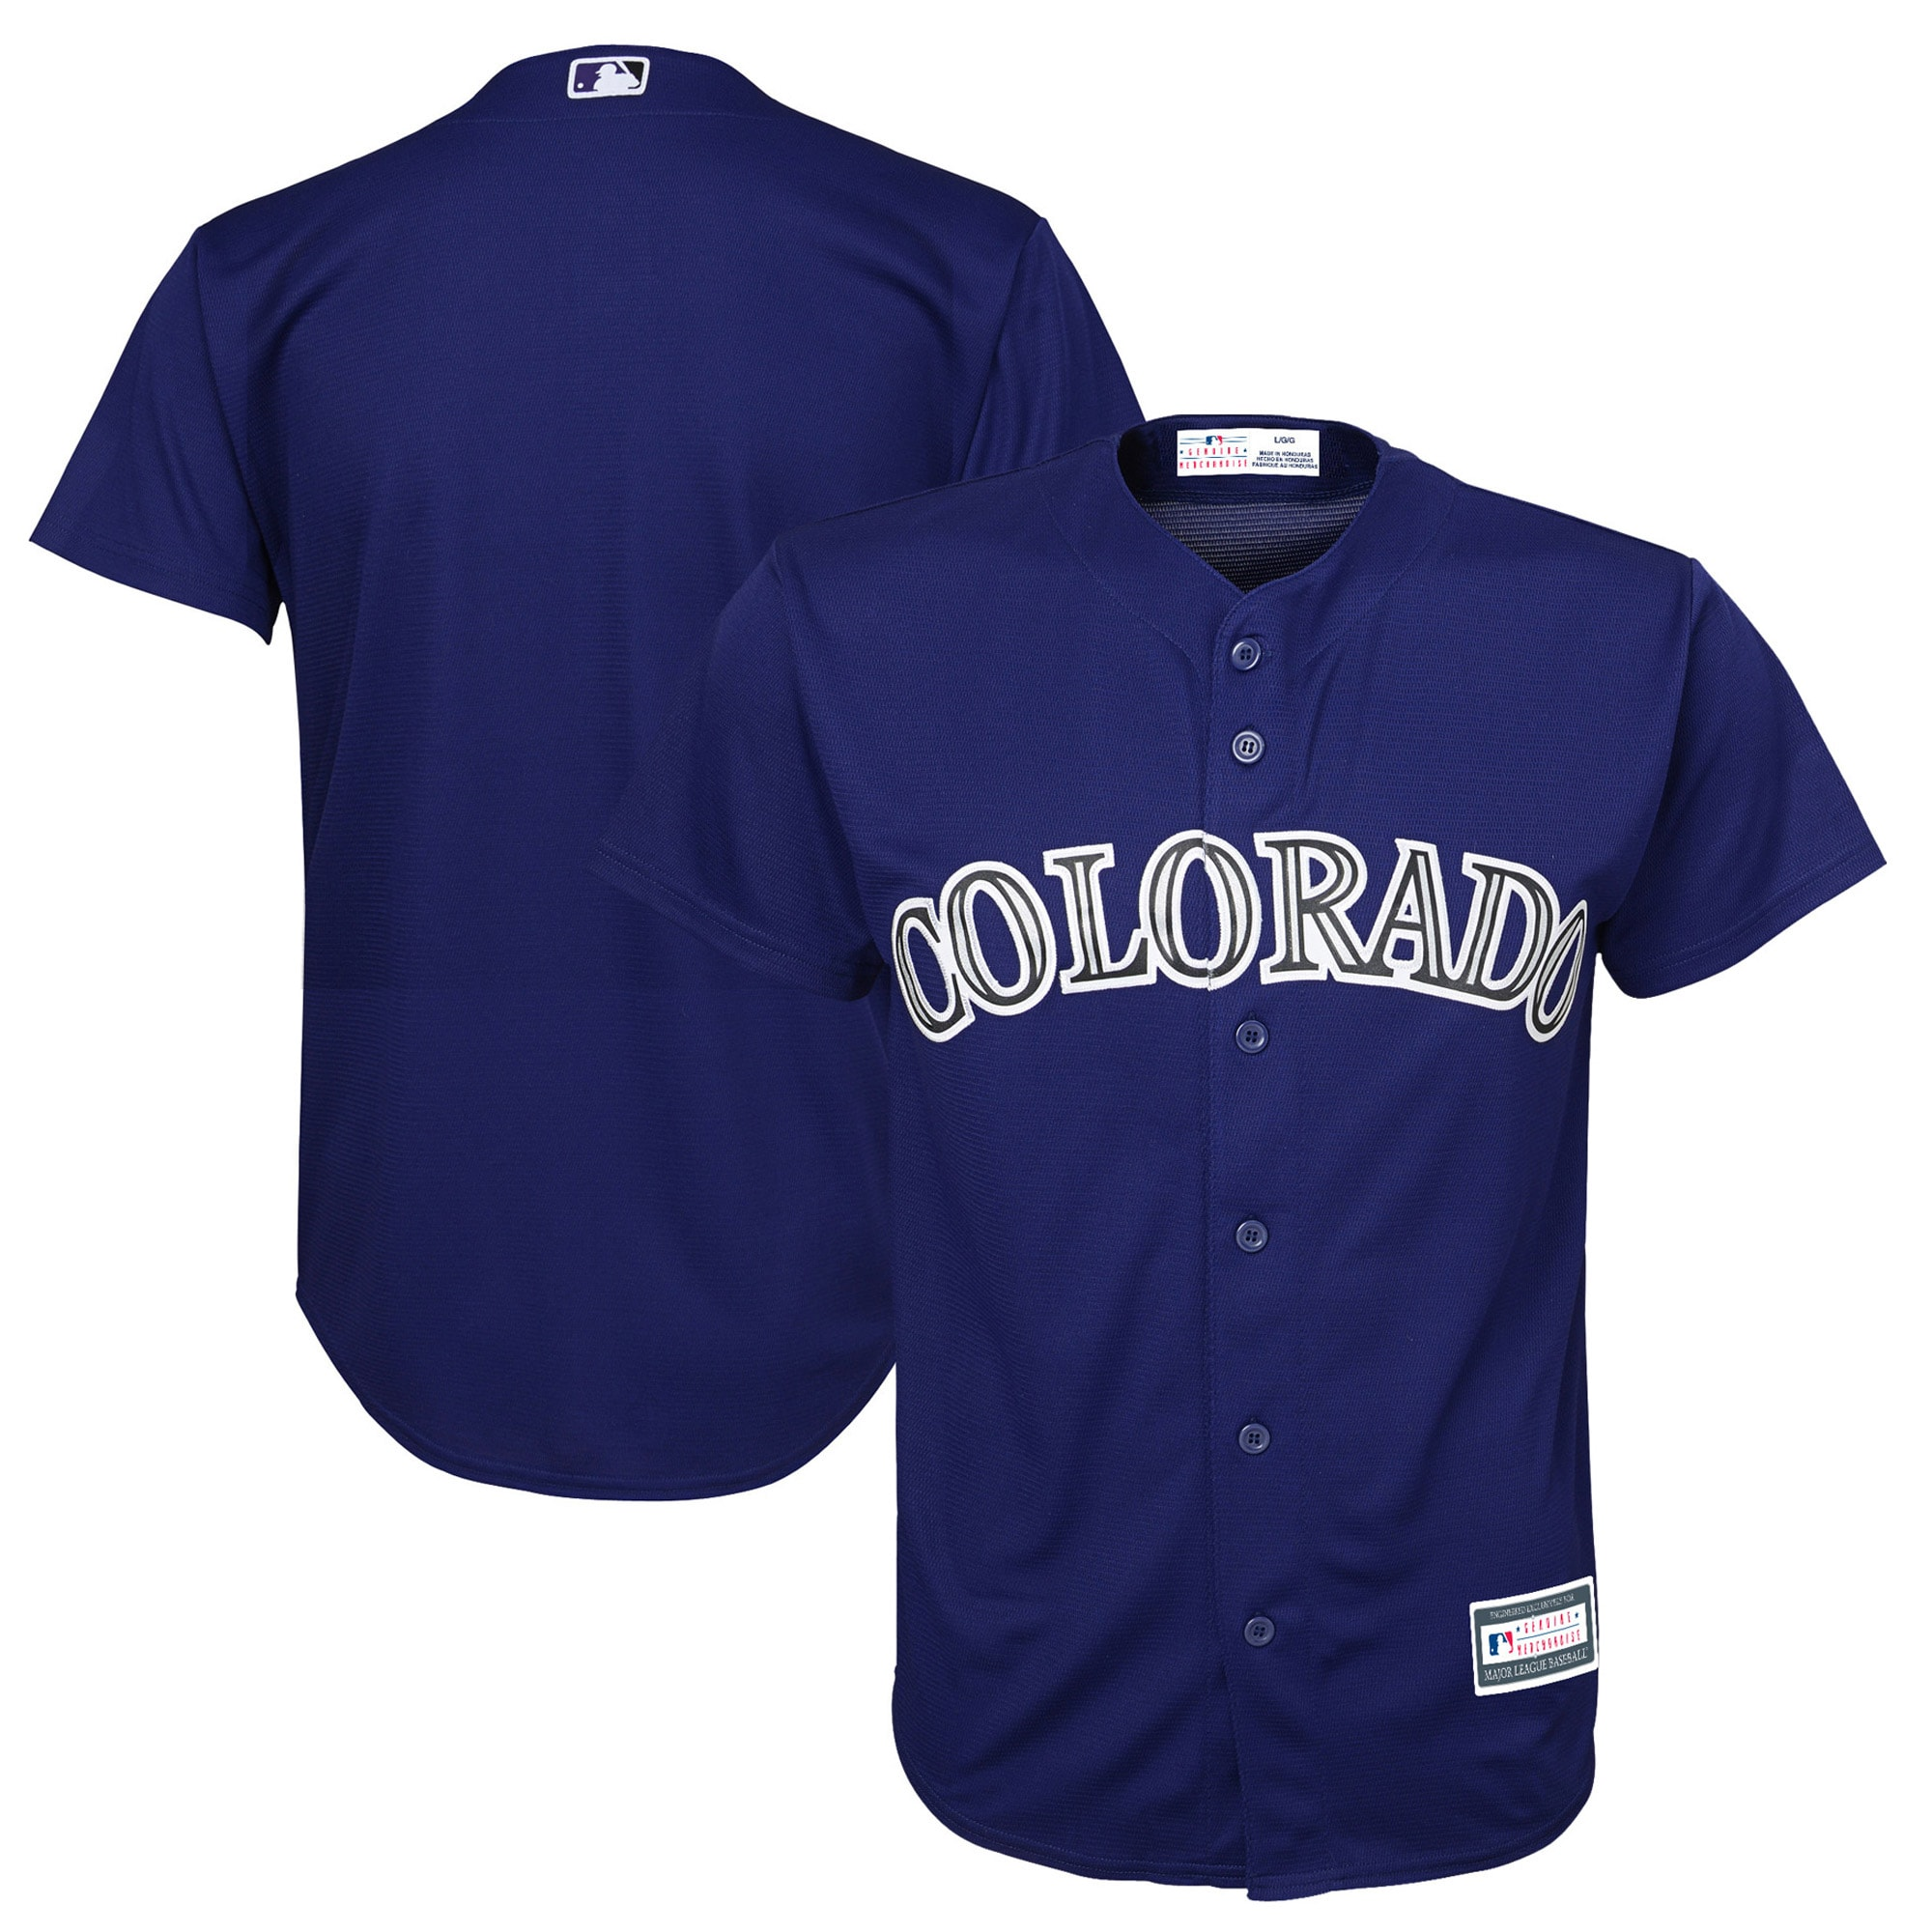 Colorado Rockies Youth Alternate Replica Blank Team Jersey - Purple